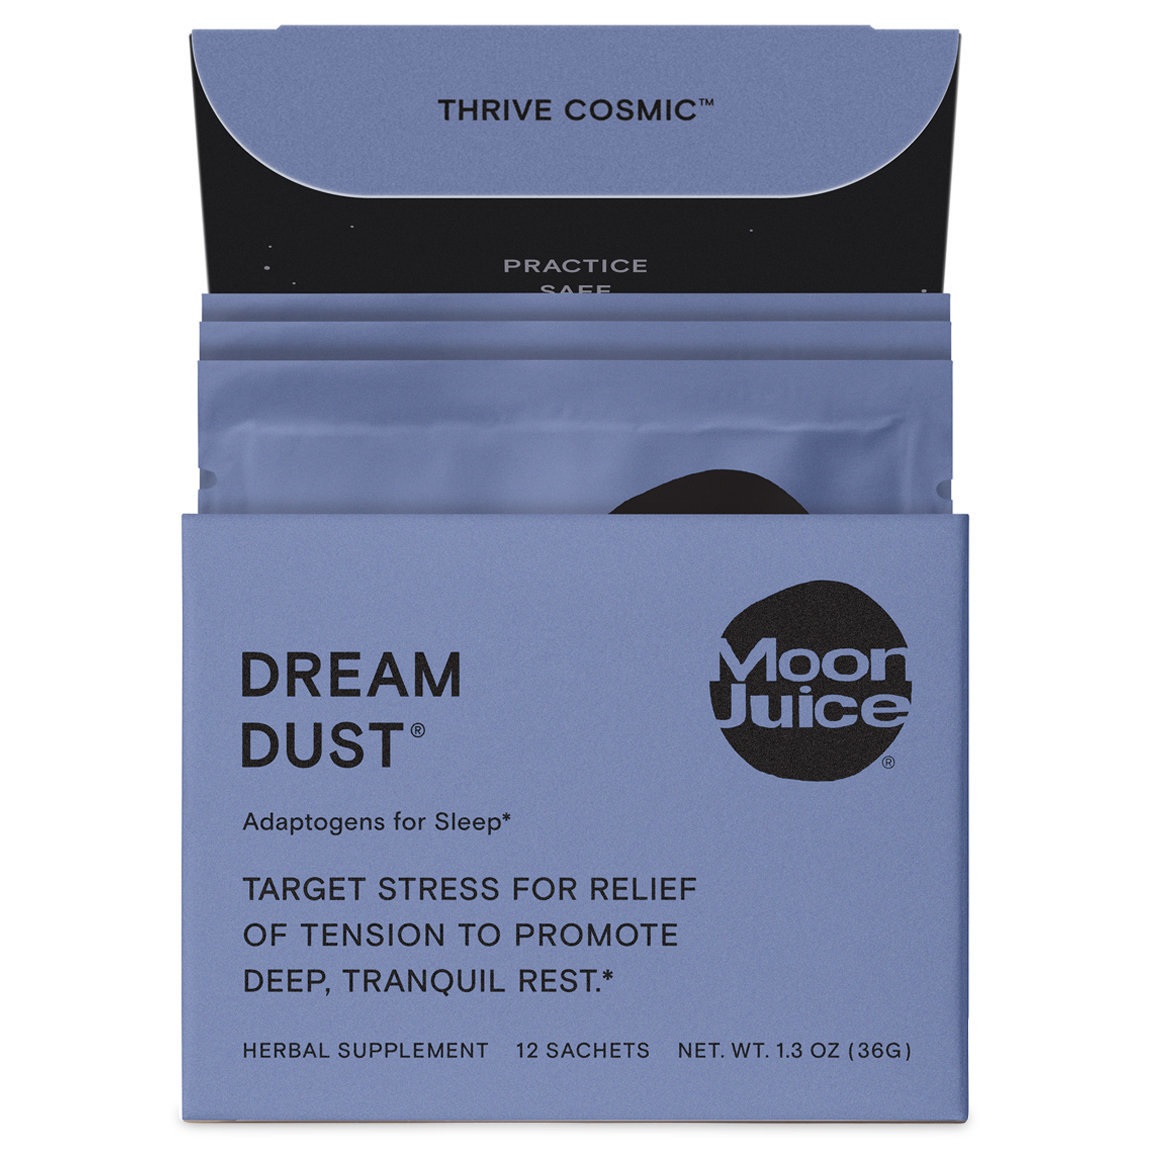 Moon Juice Dream Dust Sachets